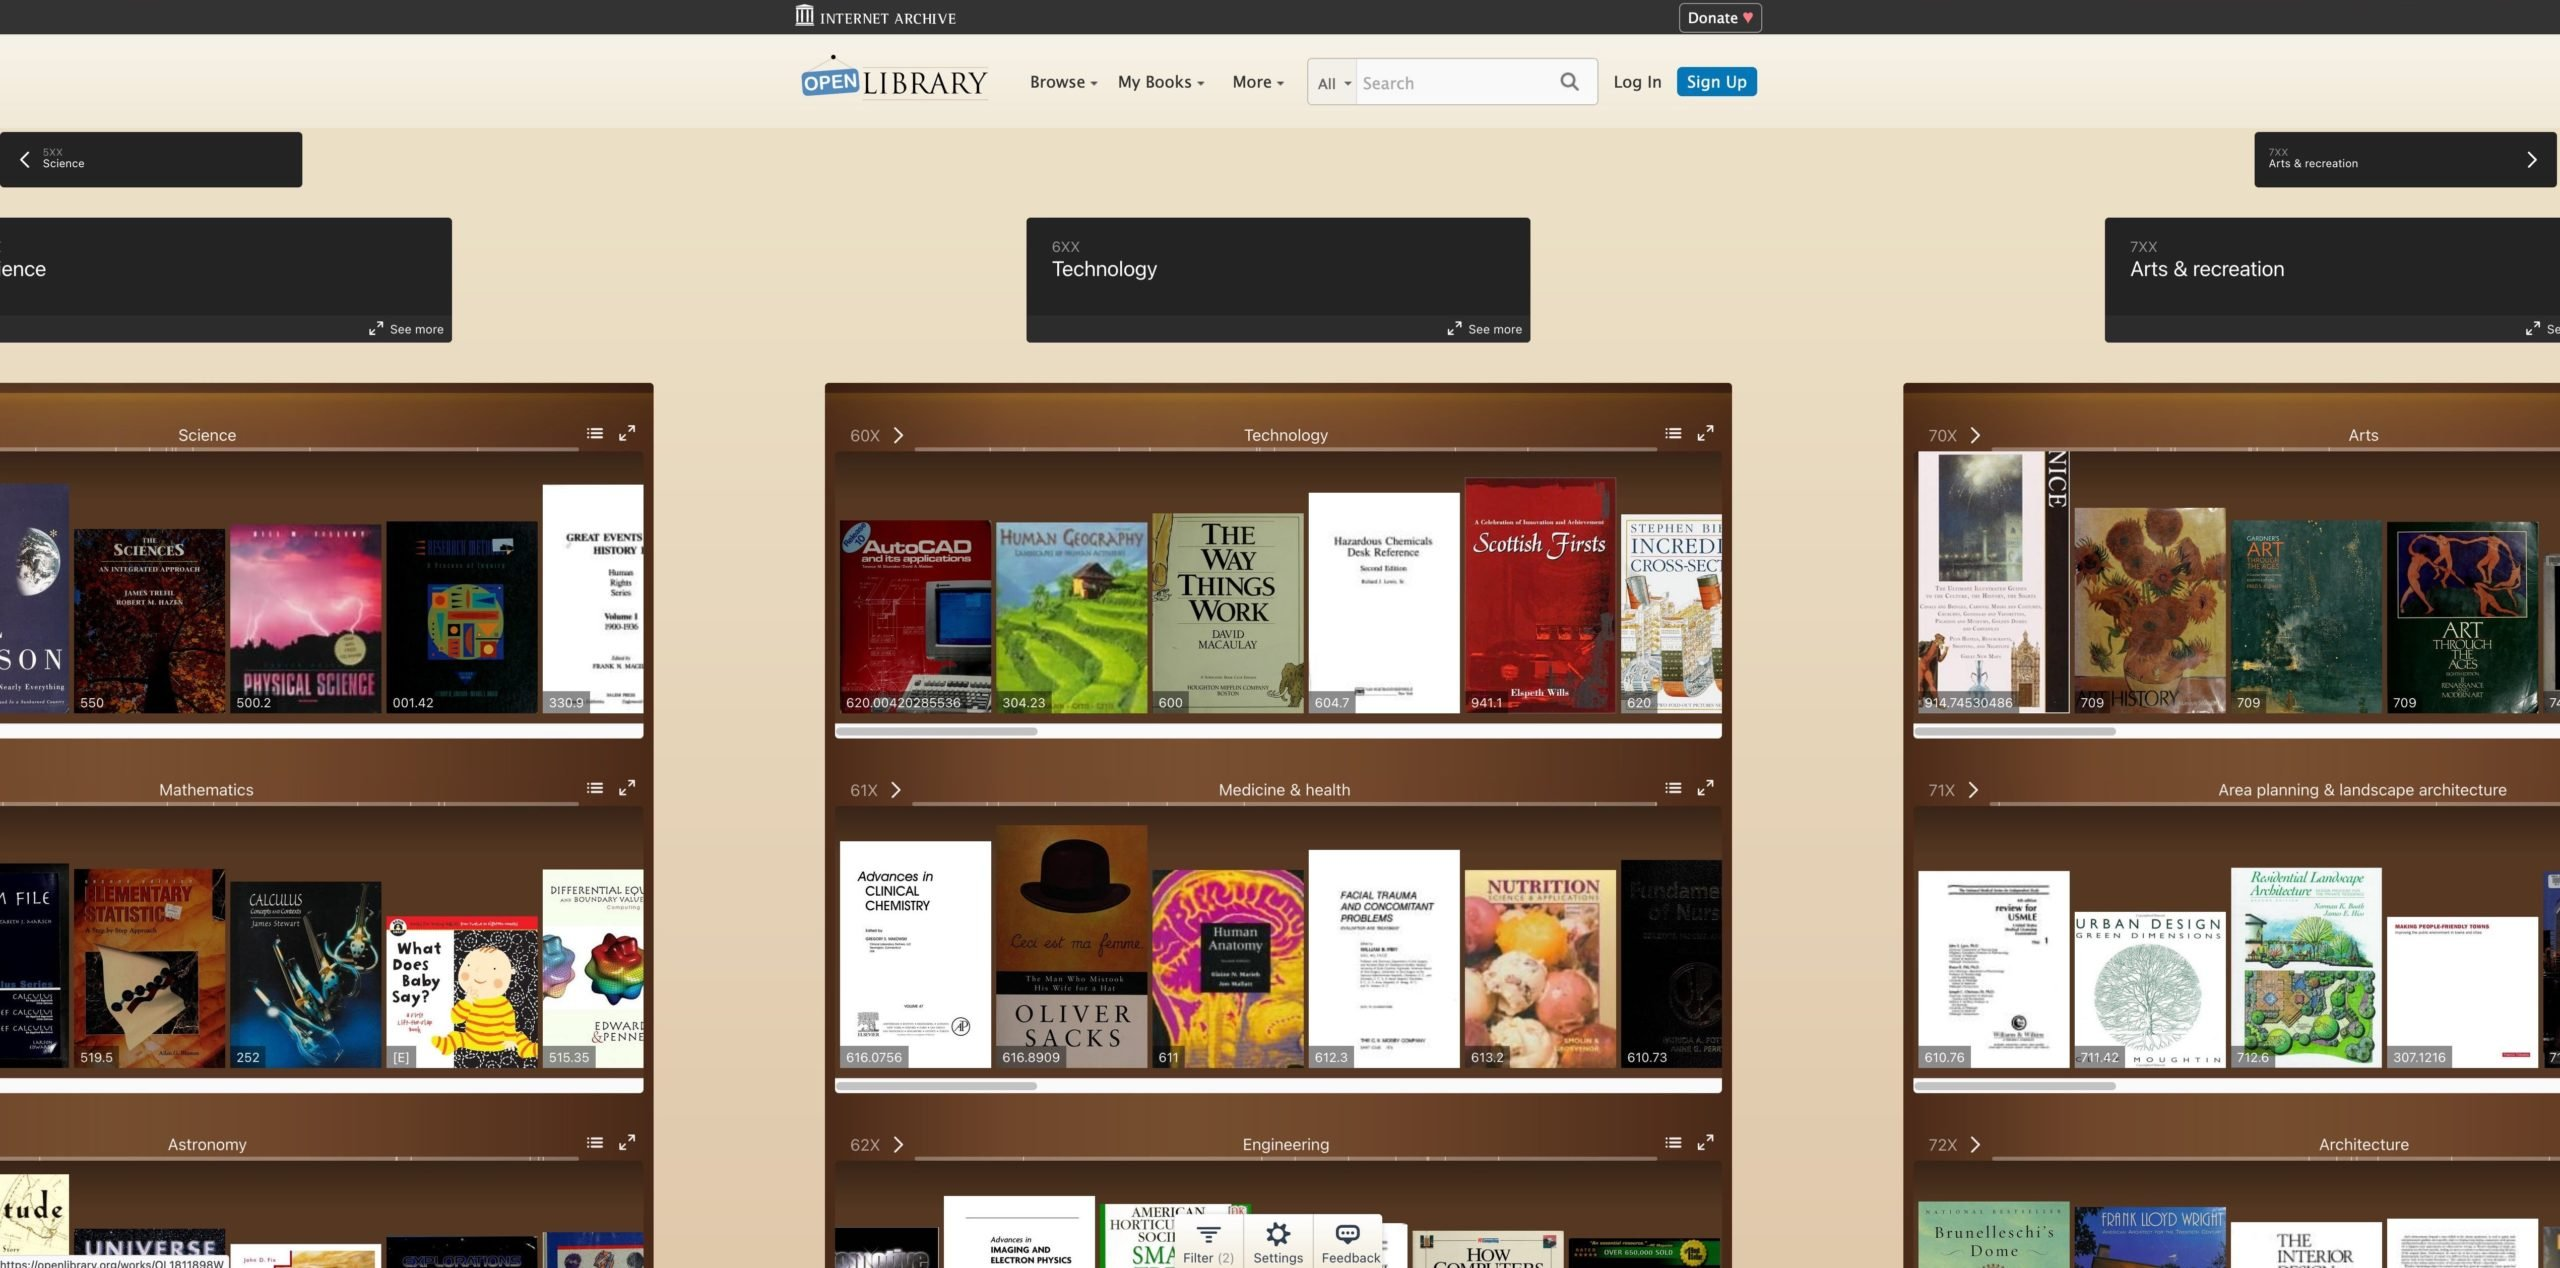 Open Library – Emprunter des livres gratuitement